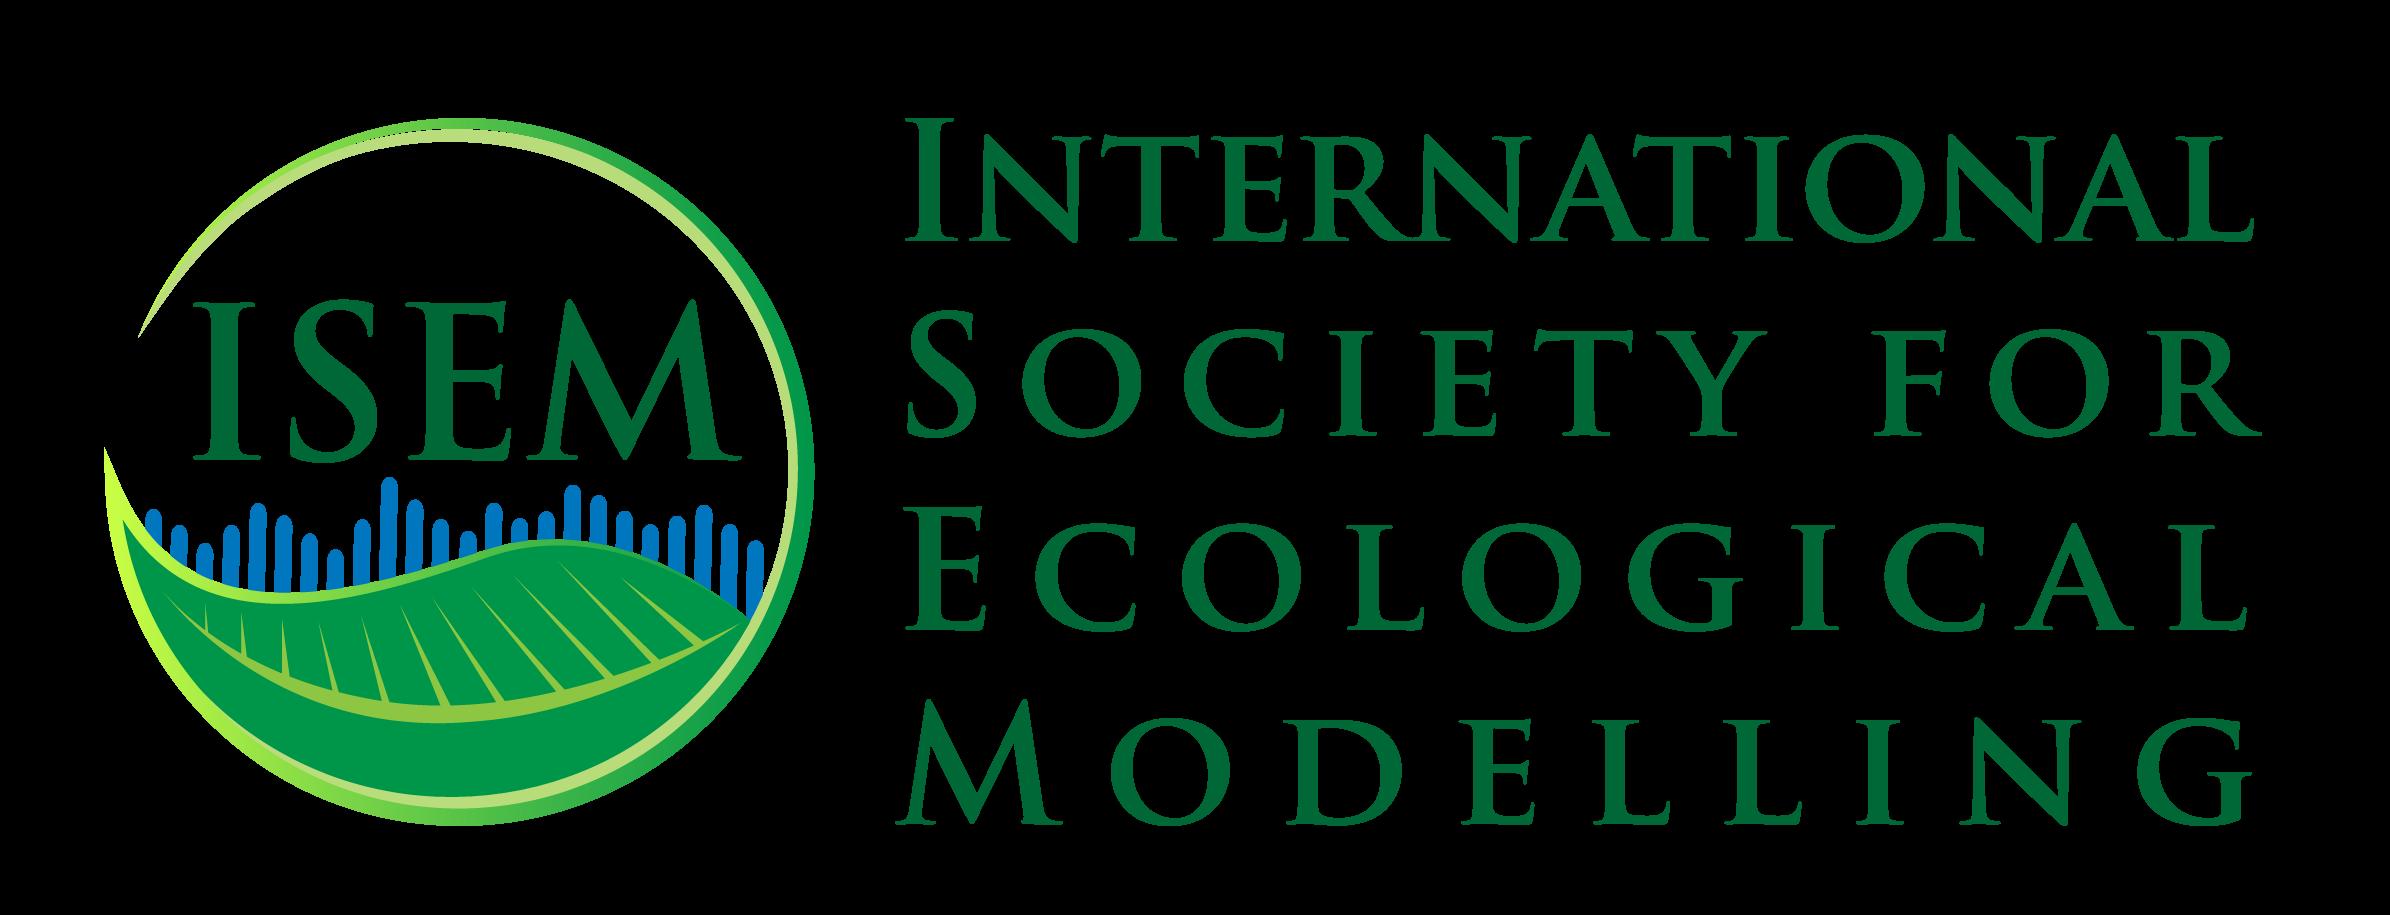 logo for International Society of Ecological Modelling